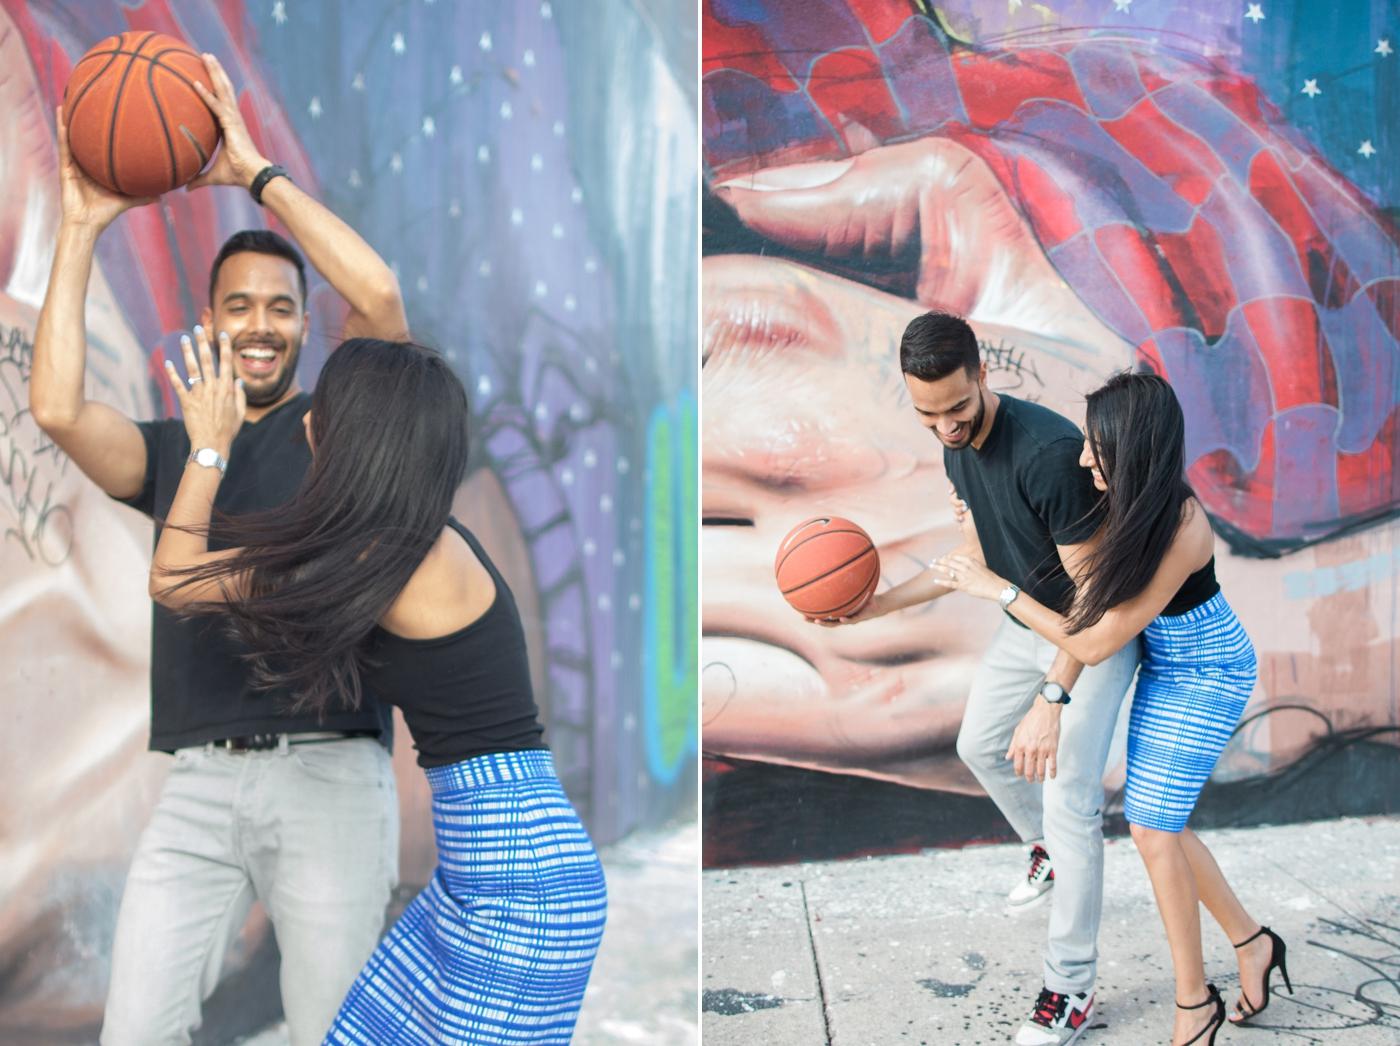 Etka + Vishesh | Engagement Session, Miami, FL, Miami Wedding Photographers | Häring Photography, Indian Wedding Photographer in Florida, Best Muslim, Hindu - South East Asian Wedding Photographers